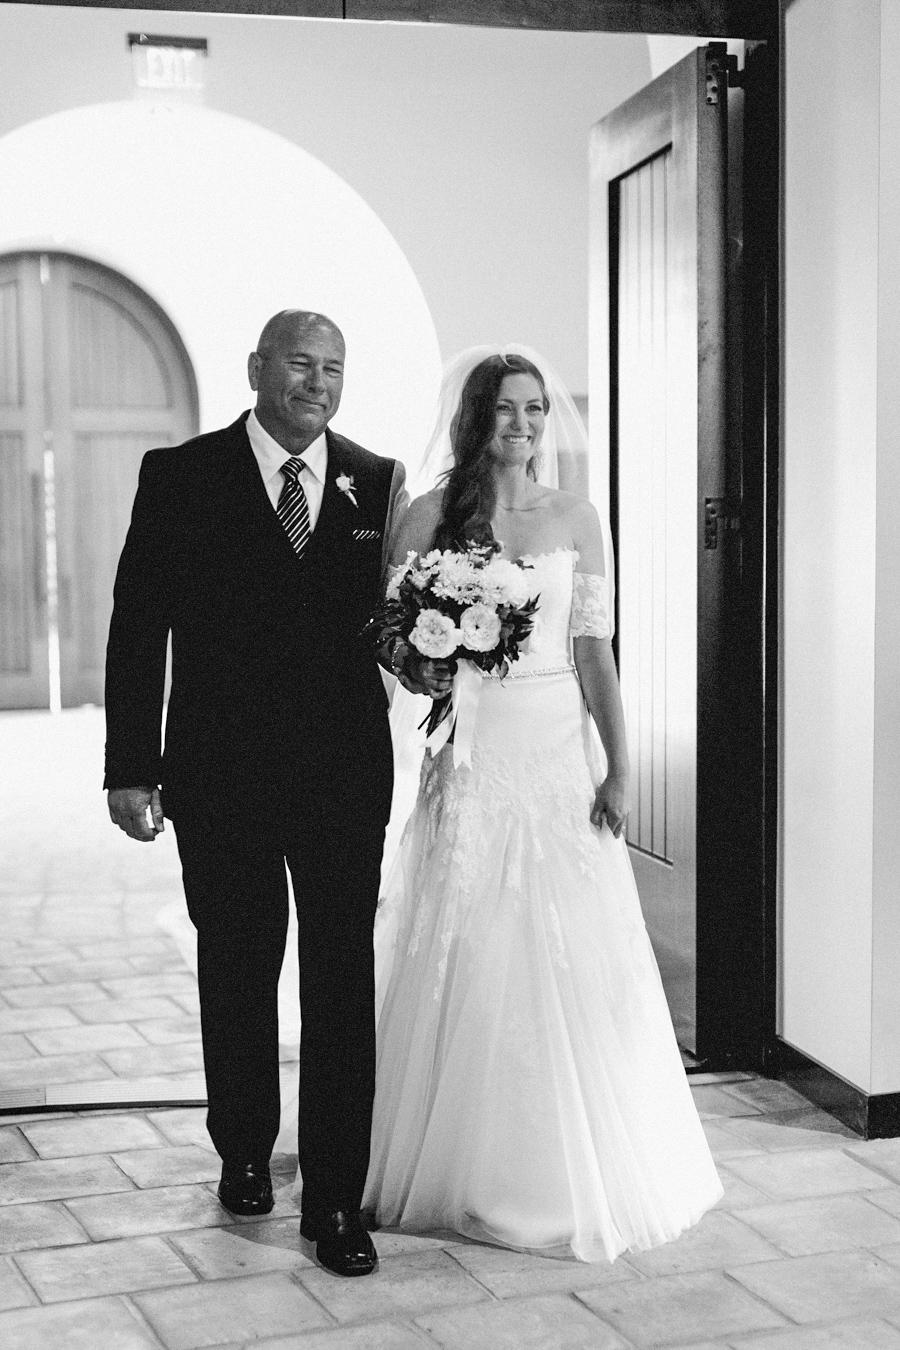 laemmlen-wedding-blog-08.jpg